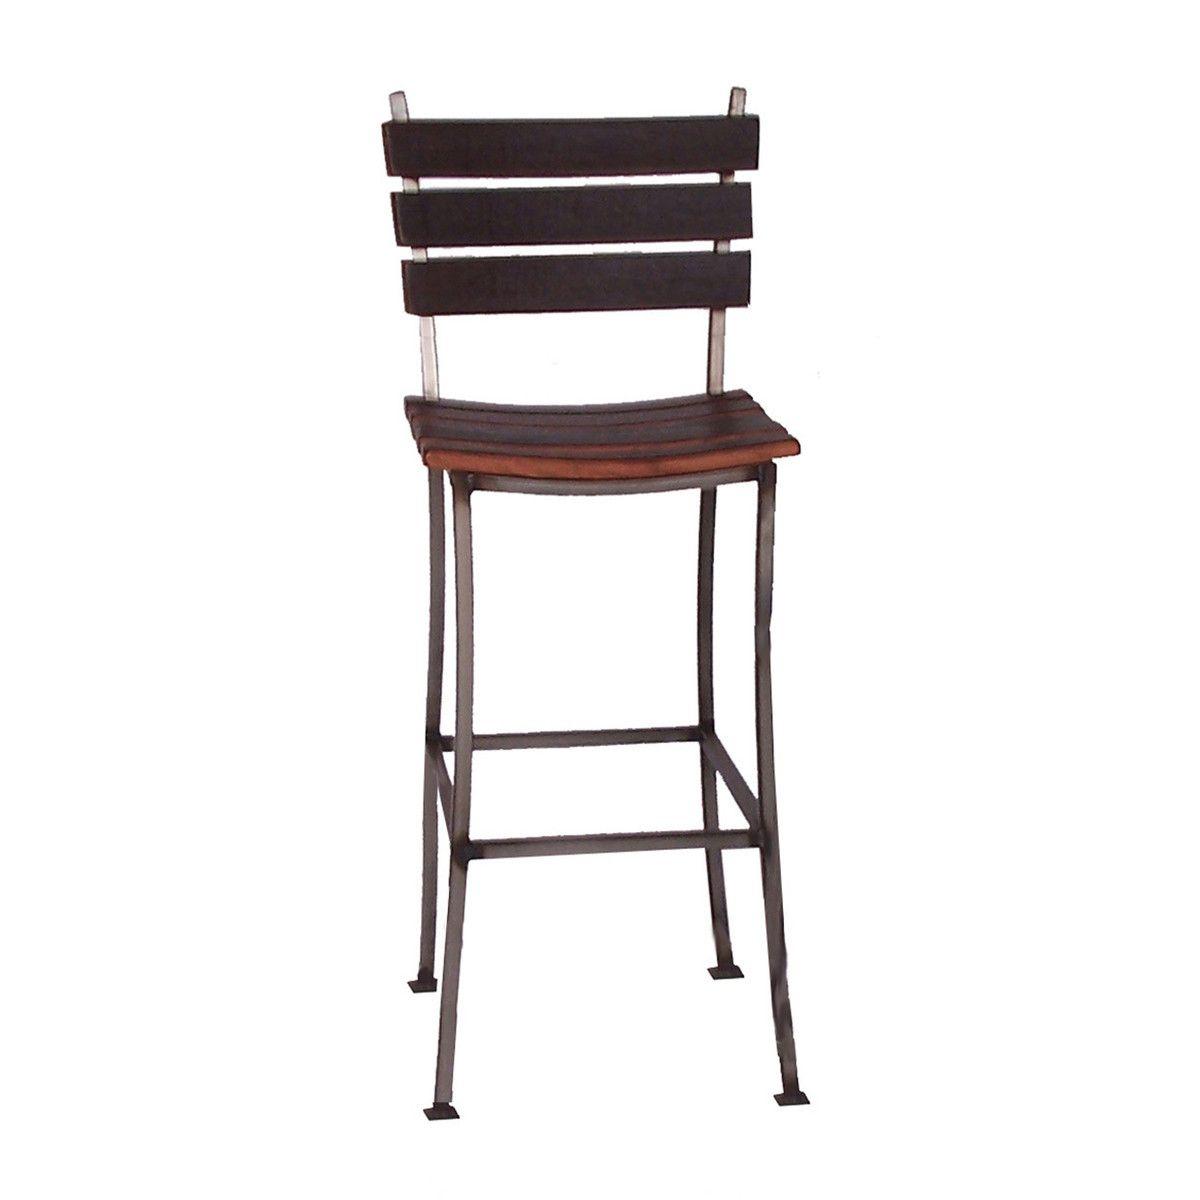 Stave Back Bar Stool 30 Recycled Wine Barrel Iron 2 Day Designs Bar Stools Wine Barrel Furniture 30 Inch Bar Stools